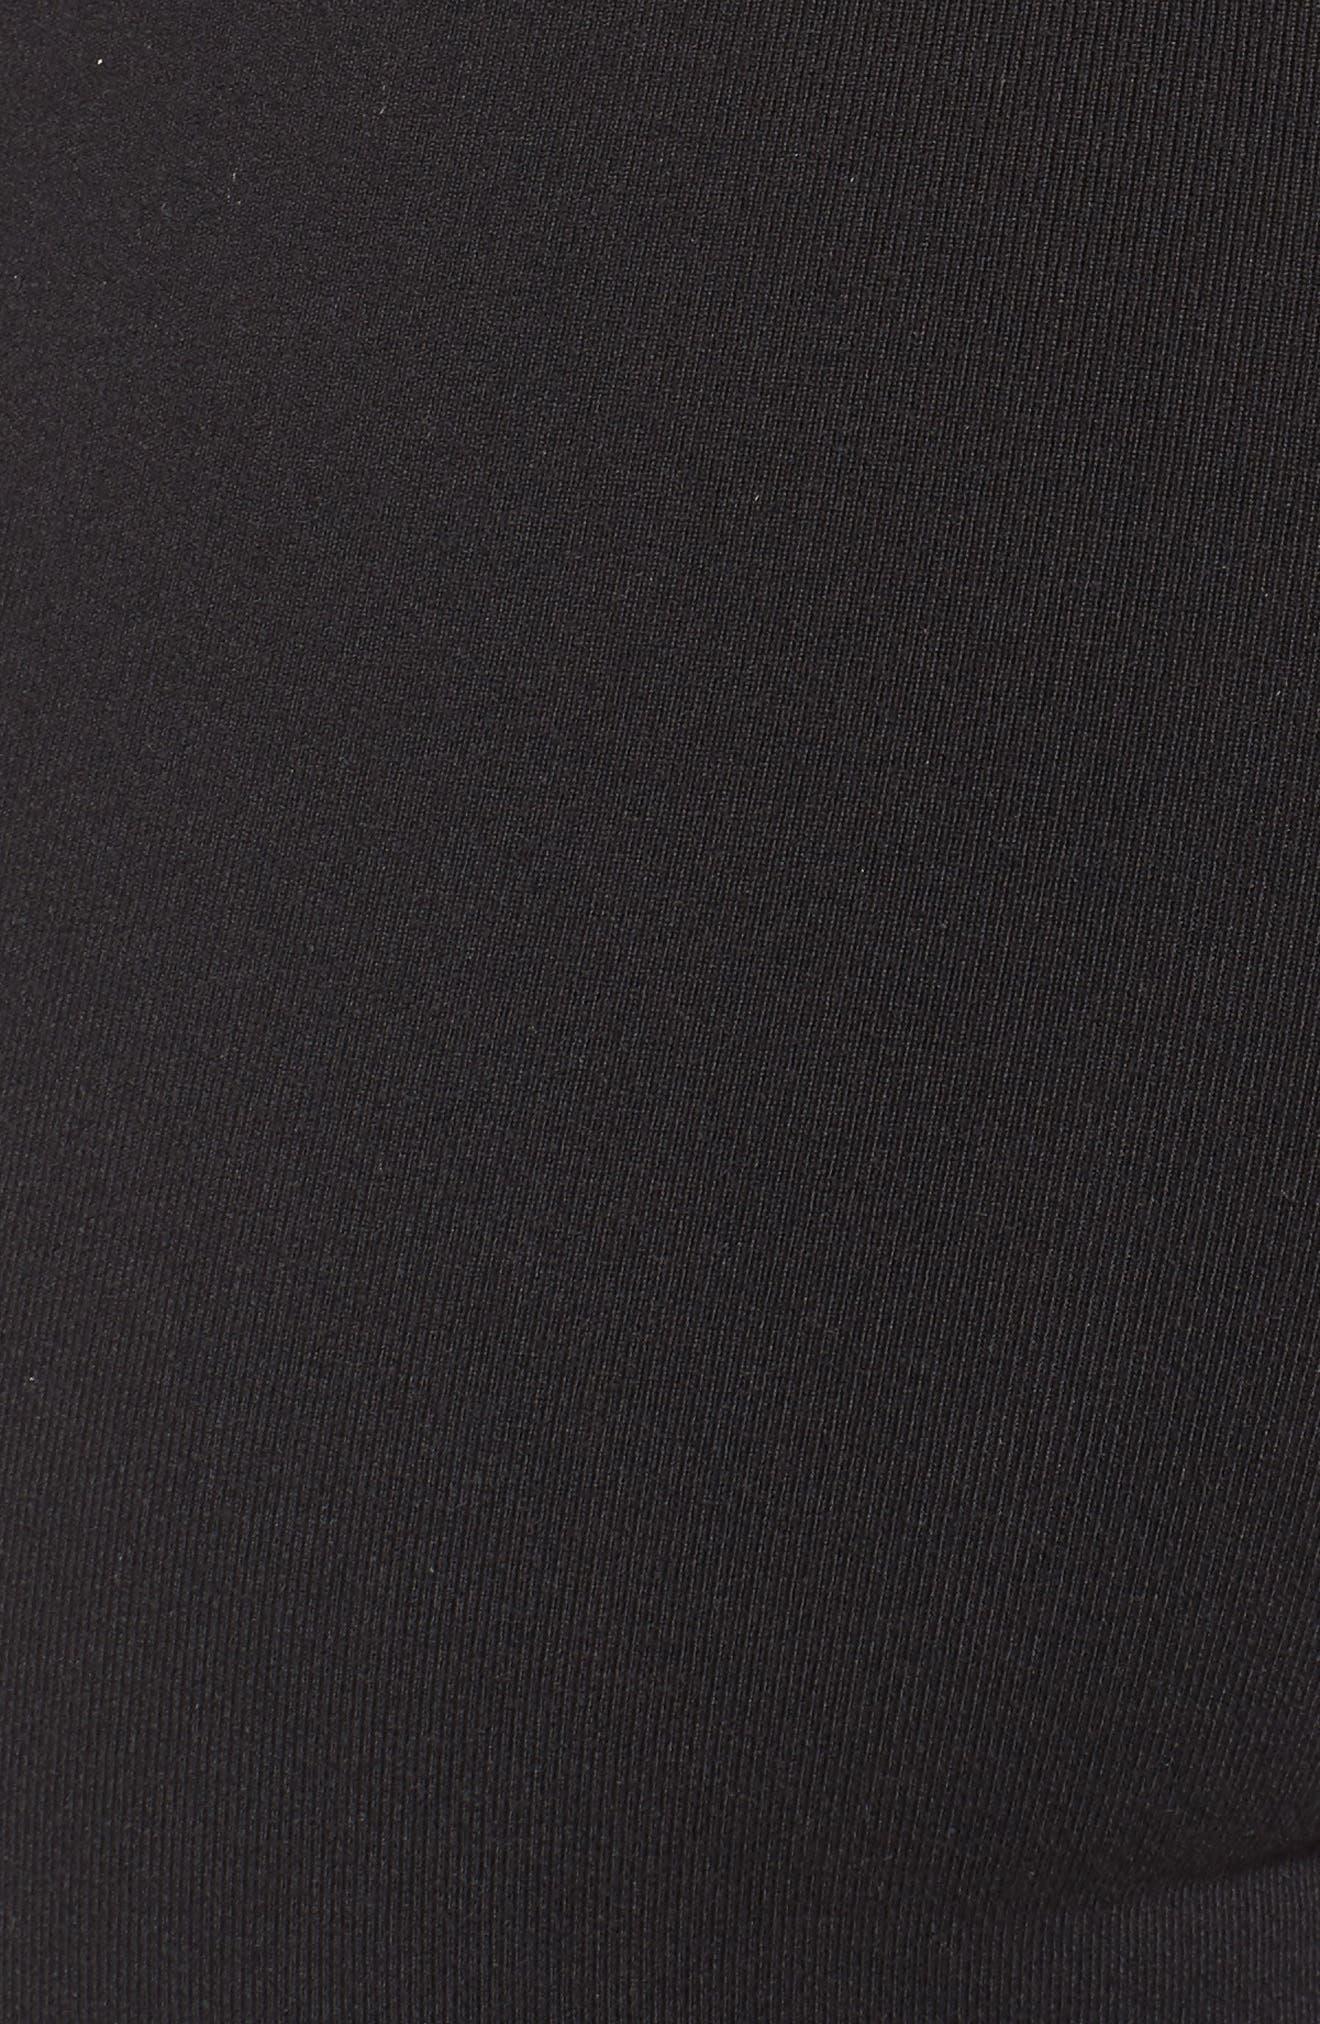 Luminous Leggings,                             Alternate thumbnail 6, color,                             Black